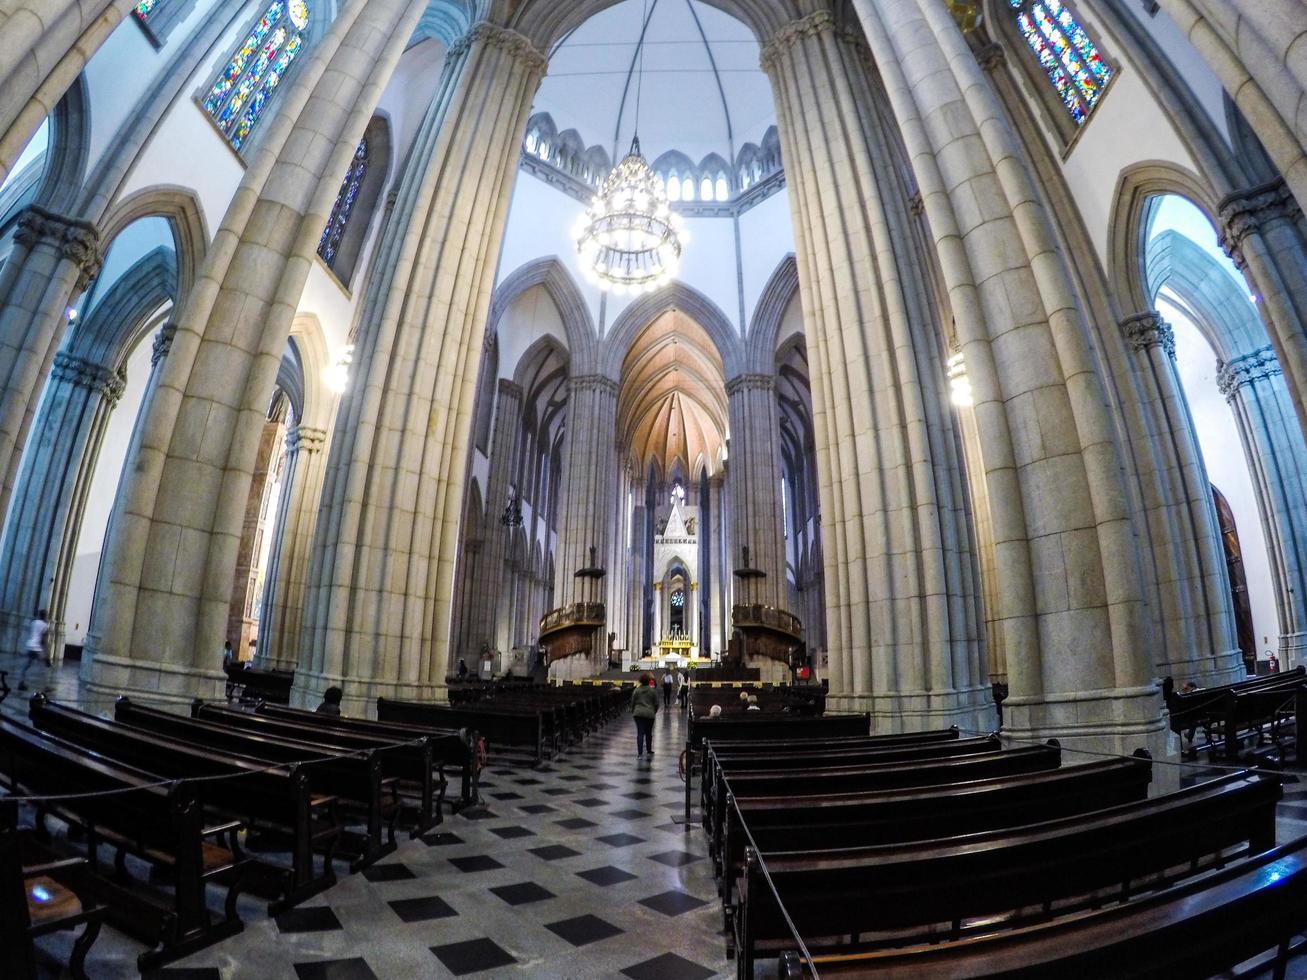 Sao Paulo, Brasilien, 01 januari 2015 - Se kyrkan i centrala Sao Paulo foto